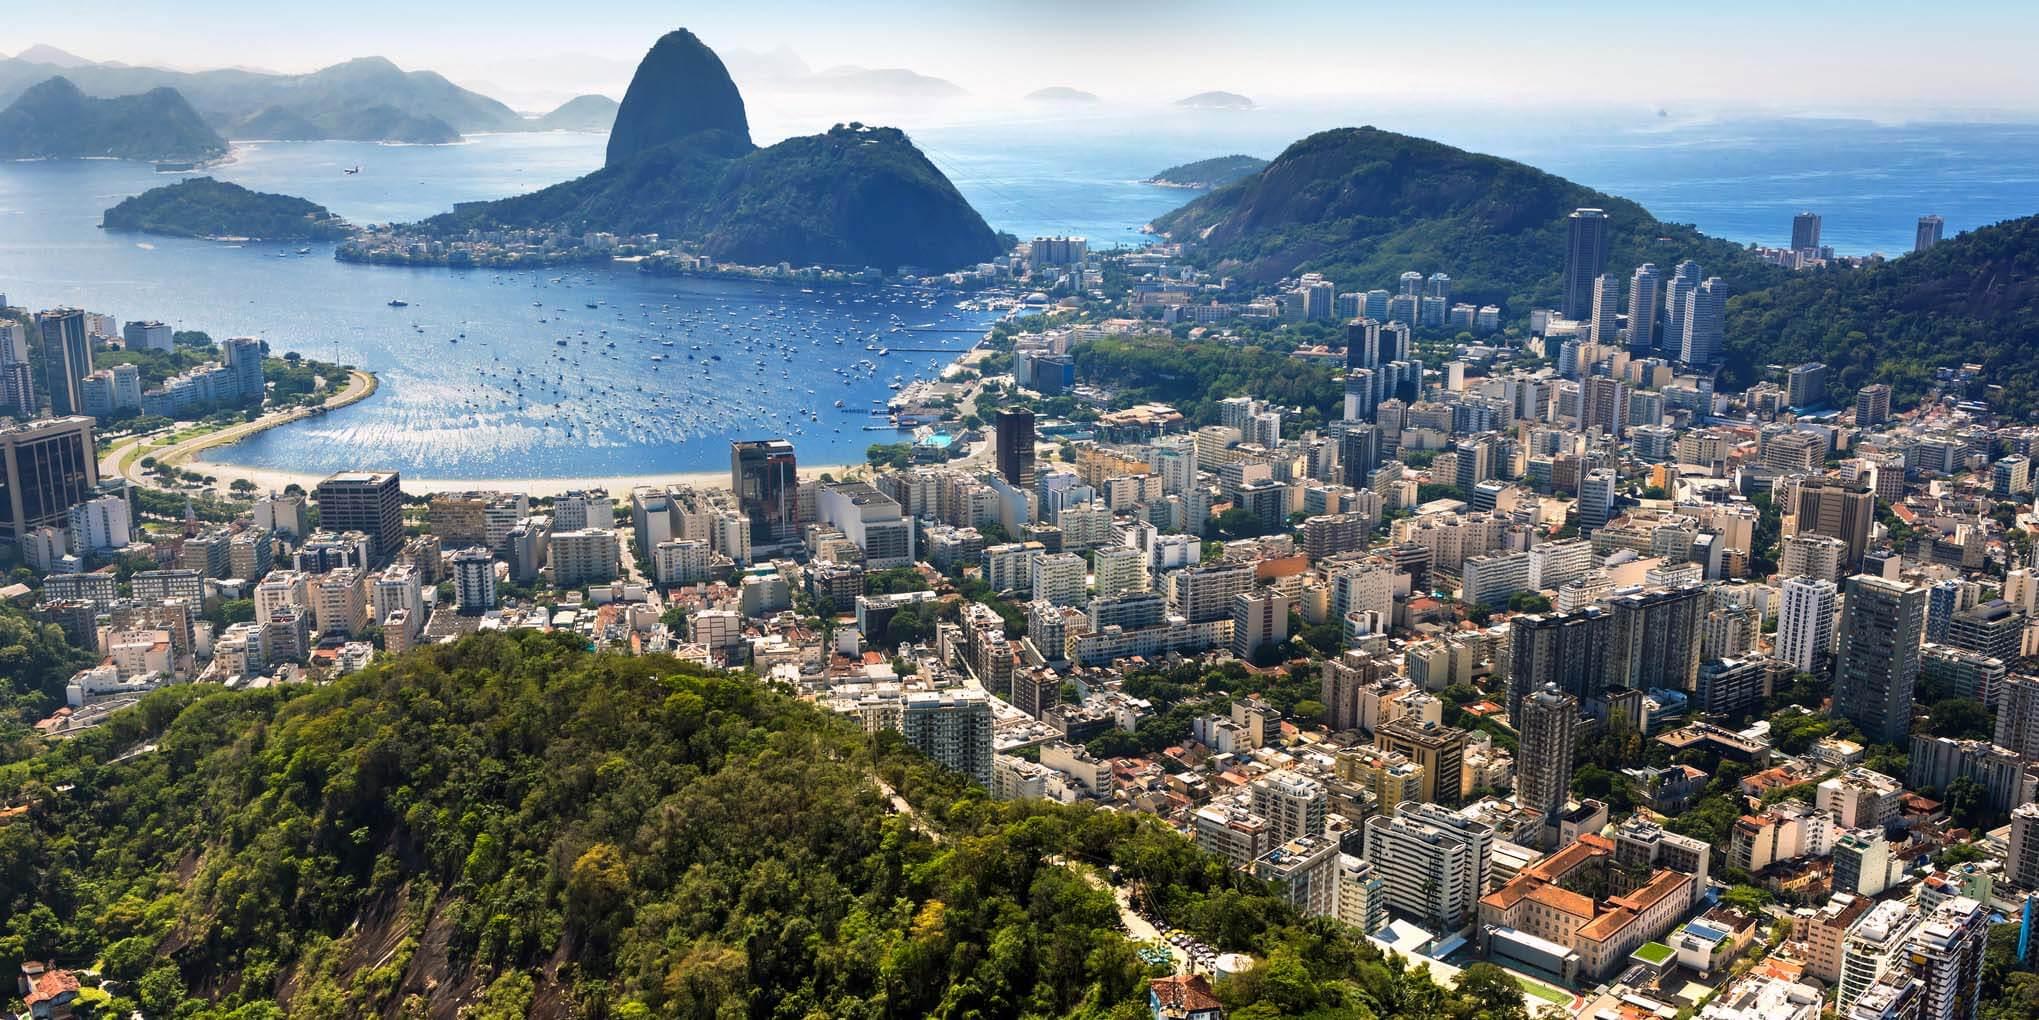 Brazilian Army Battles Pollution in Rio's Toxic Guanabara Bay Using BIM